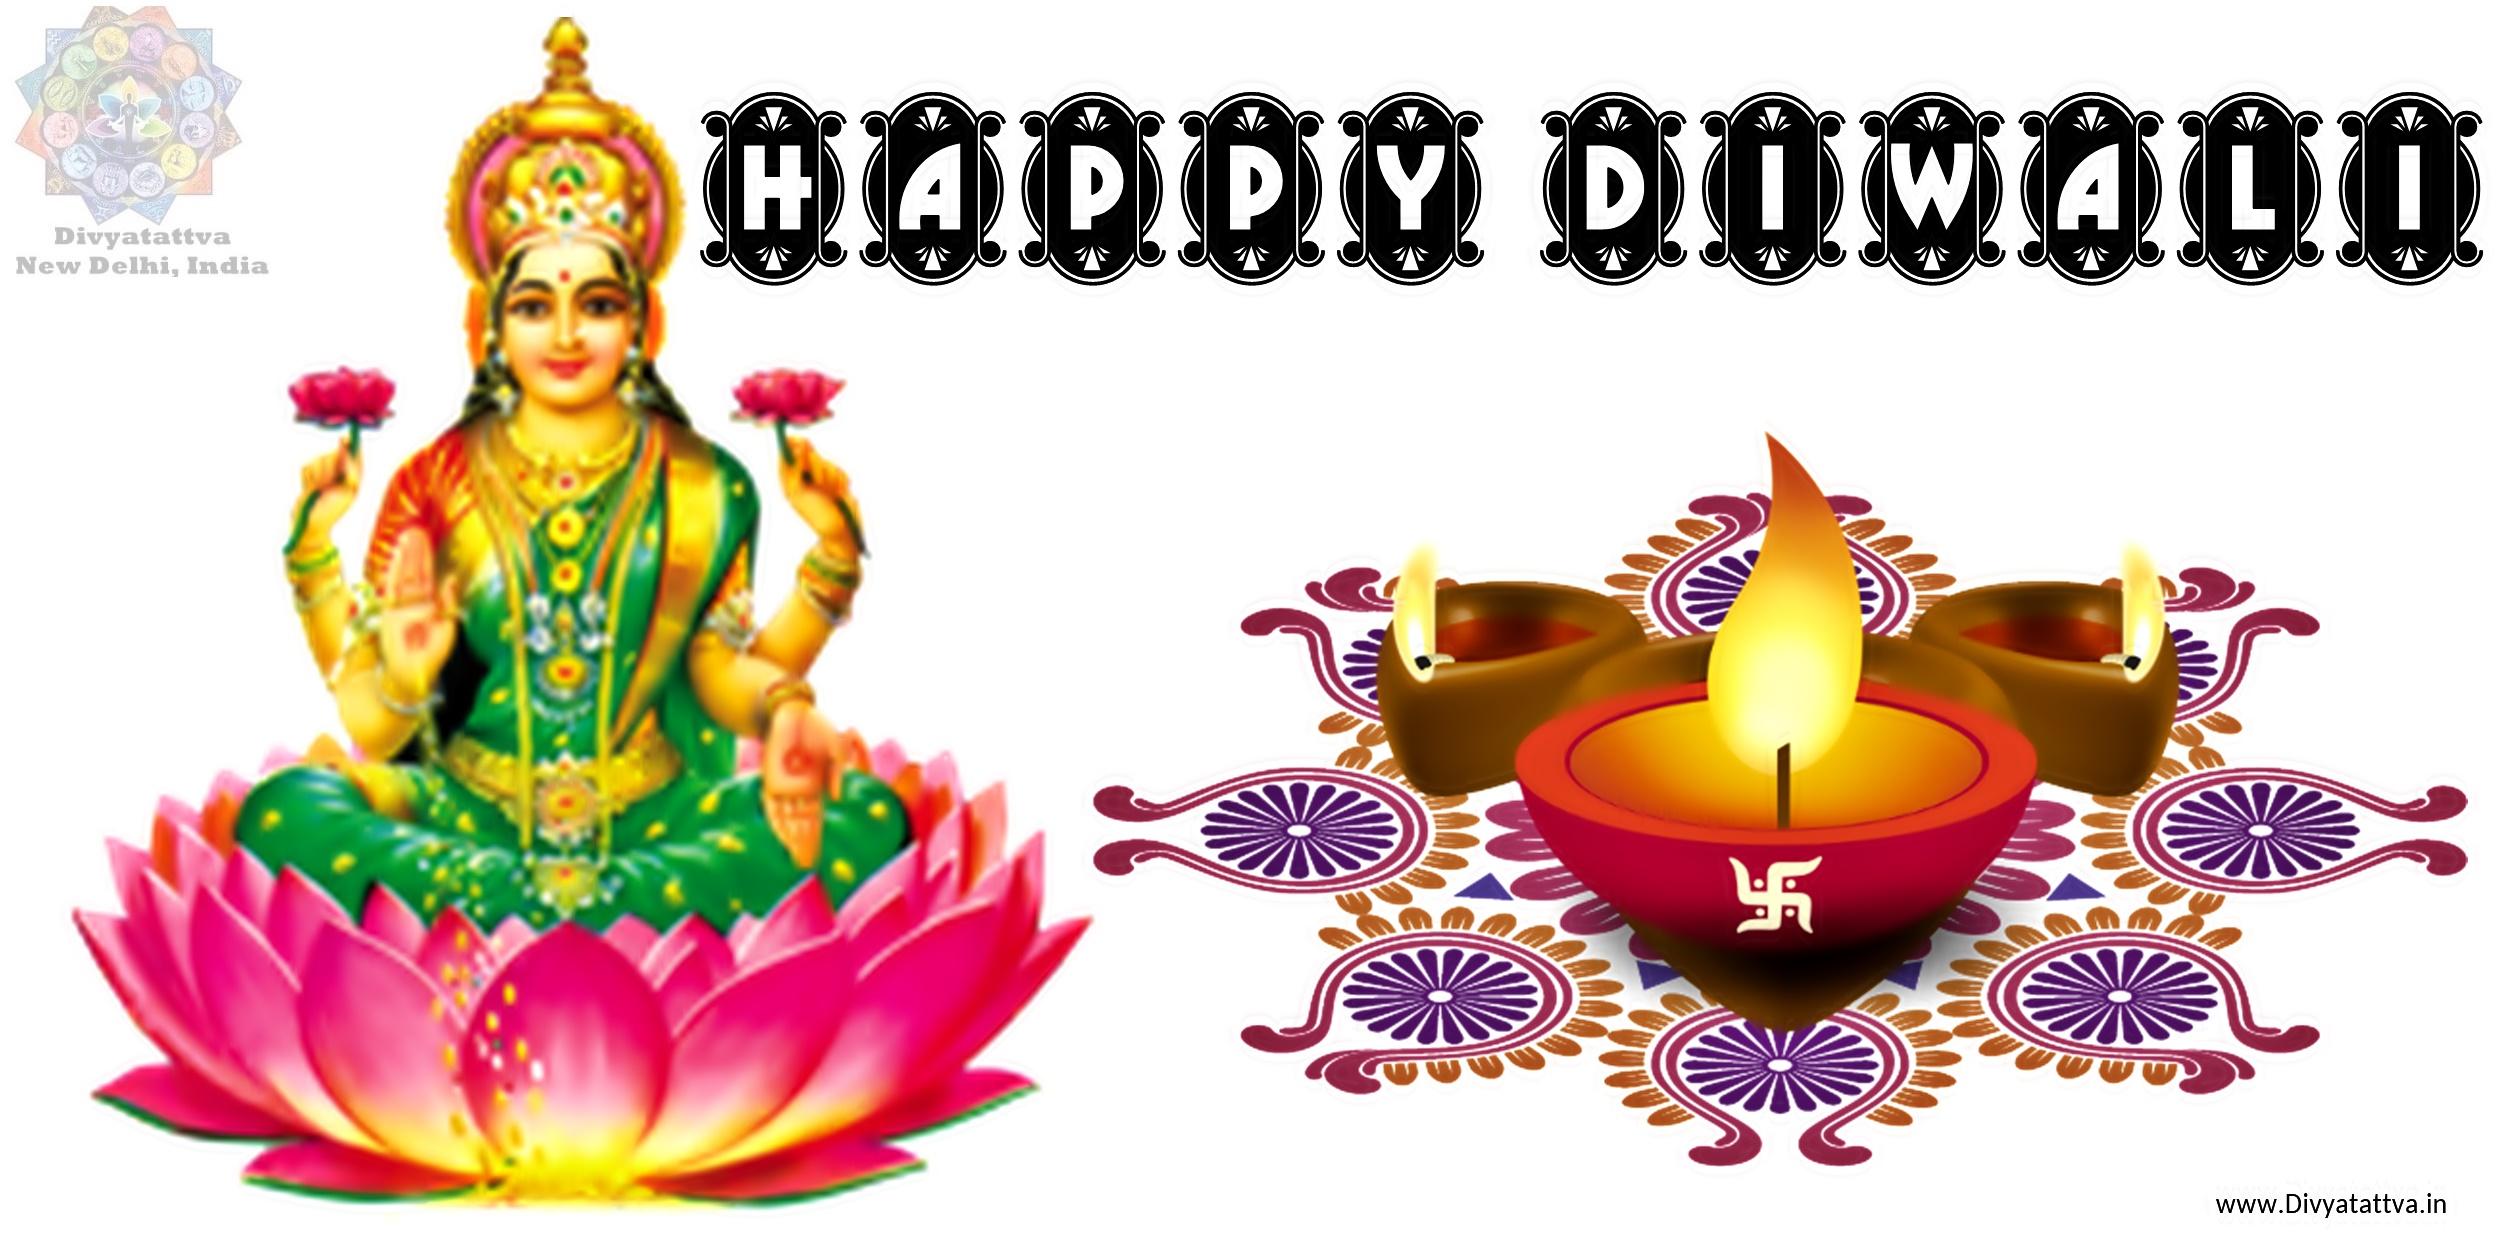 Happy Diwali 4k UHD Wallpapers, 3D Picture Greetings, Deepavali Wishes,Hindu Gods, Goddess, Luxmi, Ganesha,  Background Photos